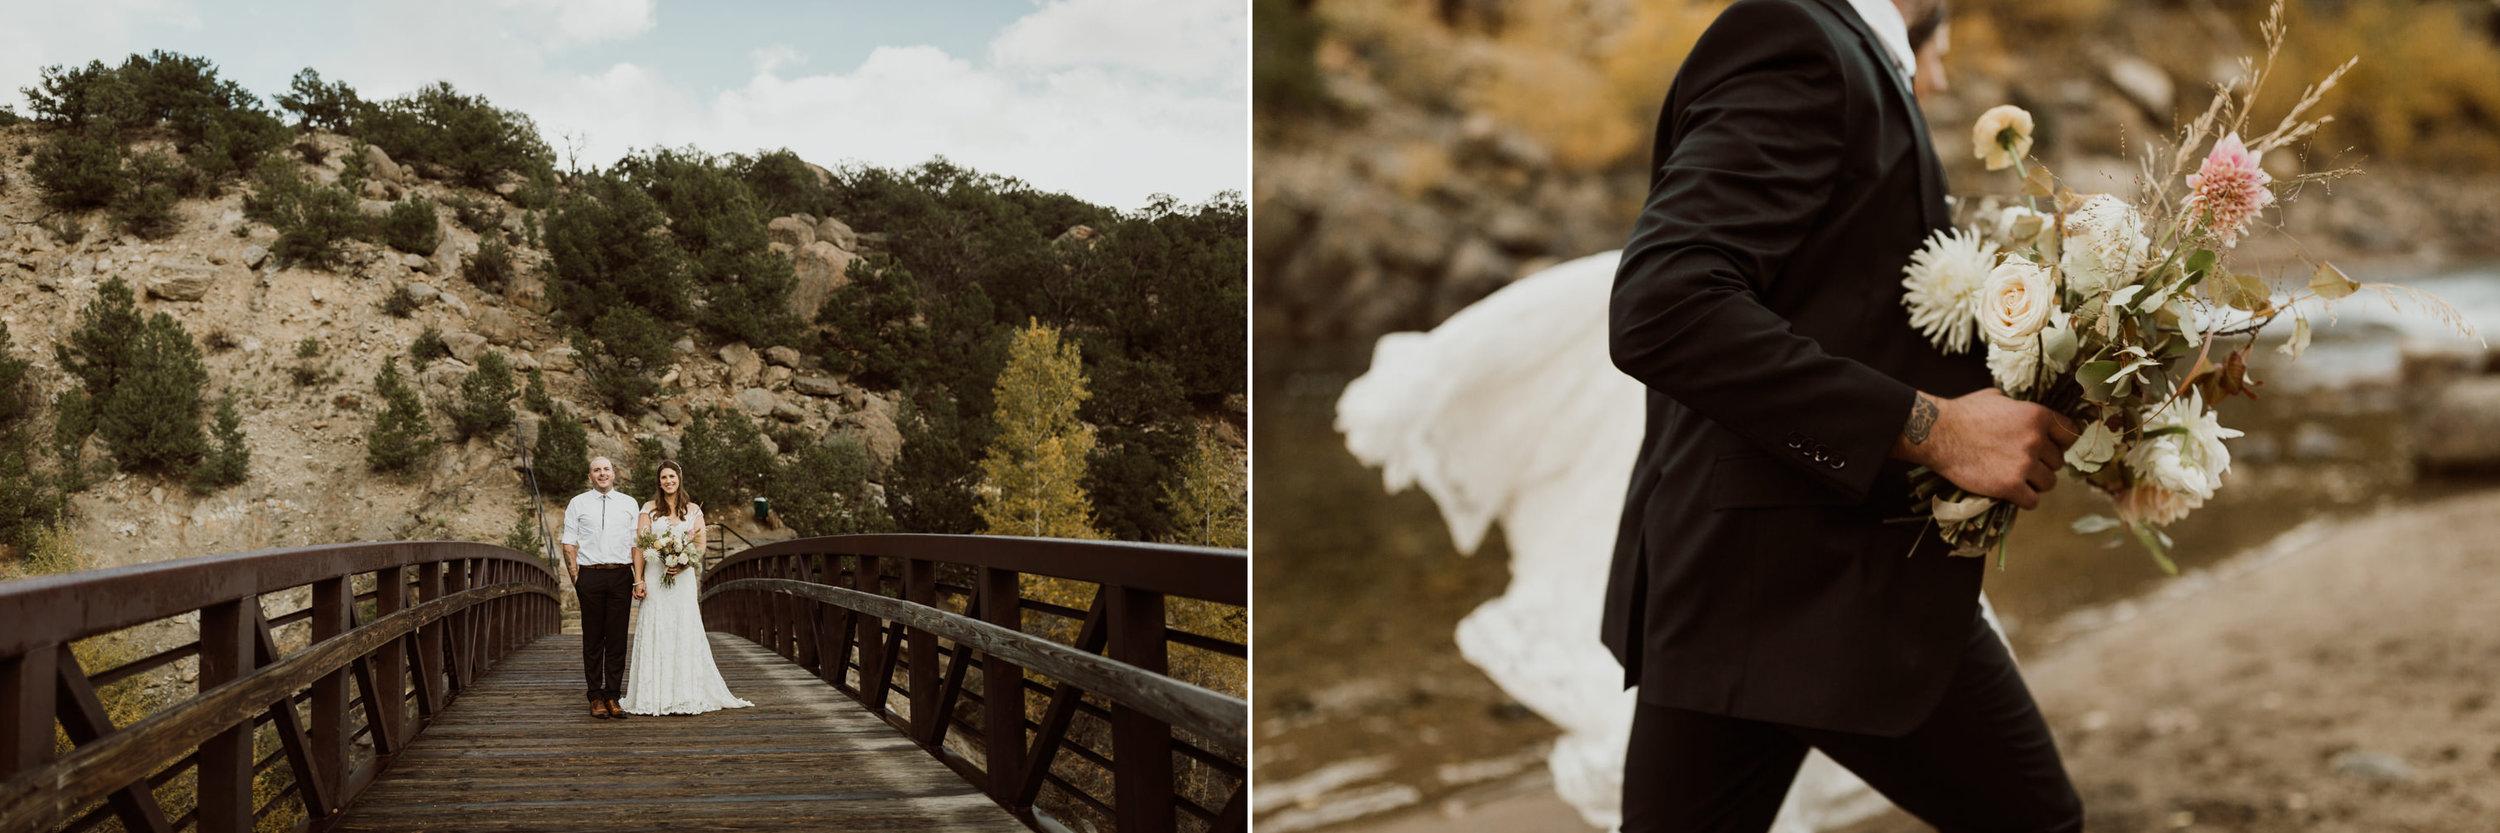 17-9-adventure-wedding-photographer-36.jpg